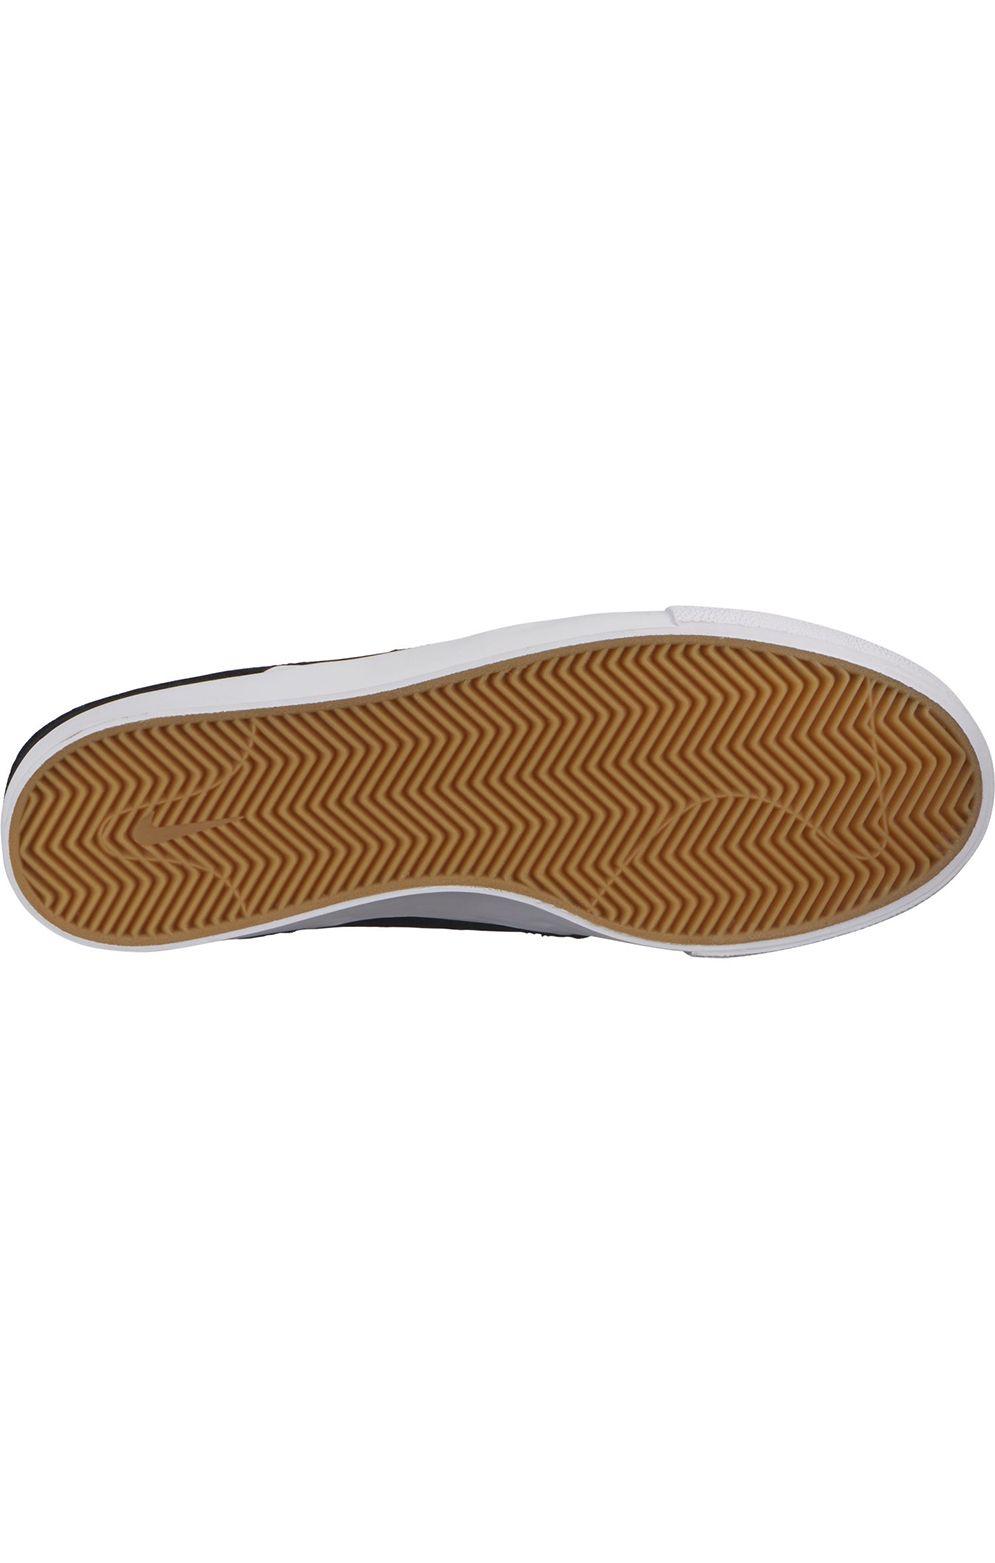 Tenis Nike Sb ZOOM JANOSKI RM Black/White-Thunder Grey-Gum Light Brown